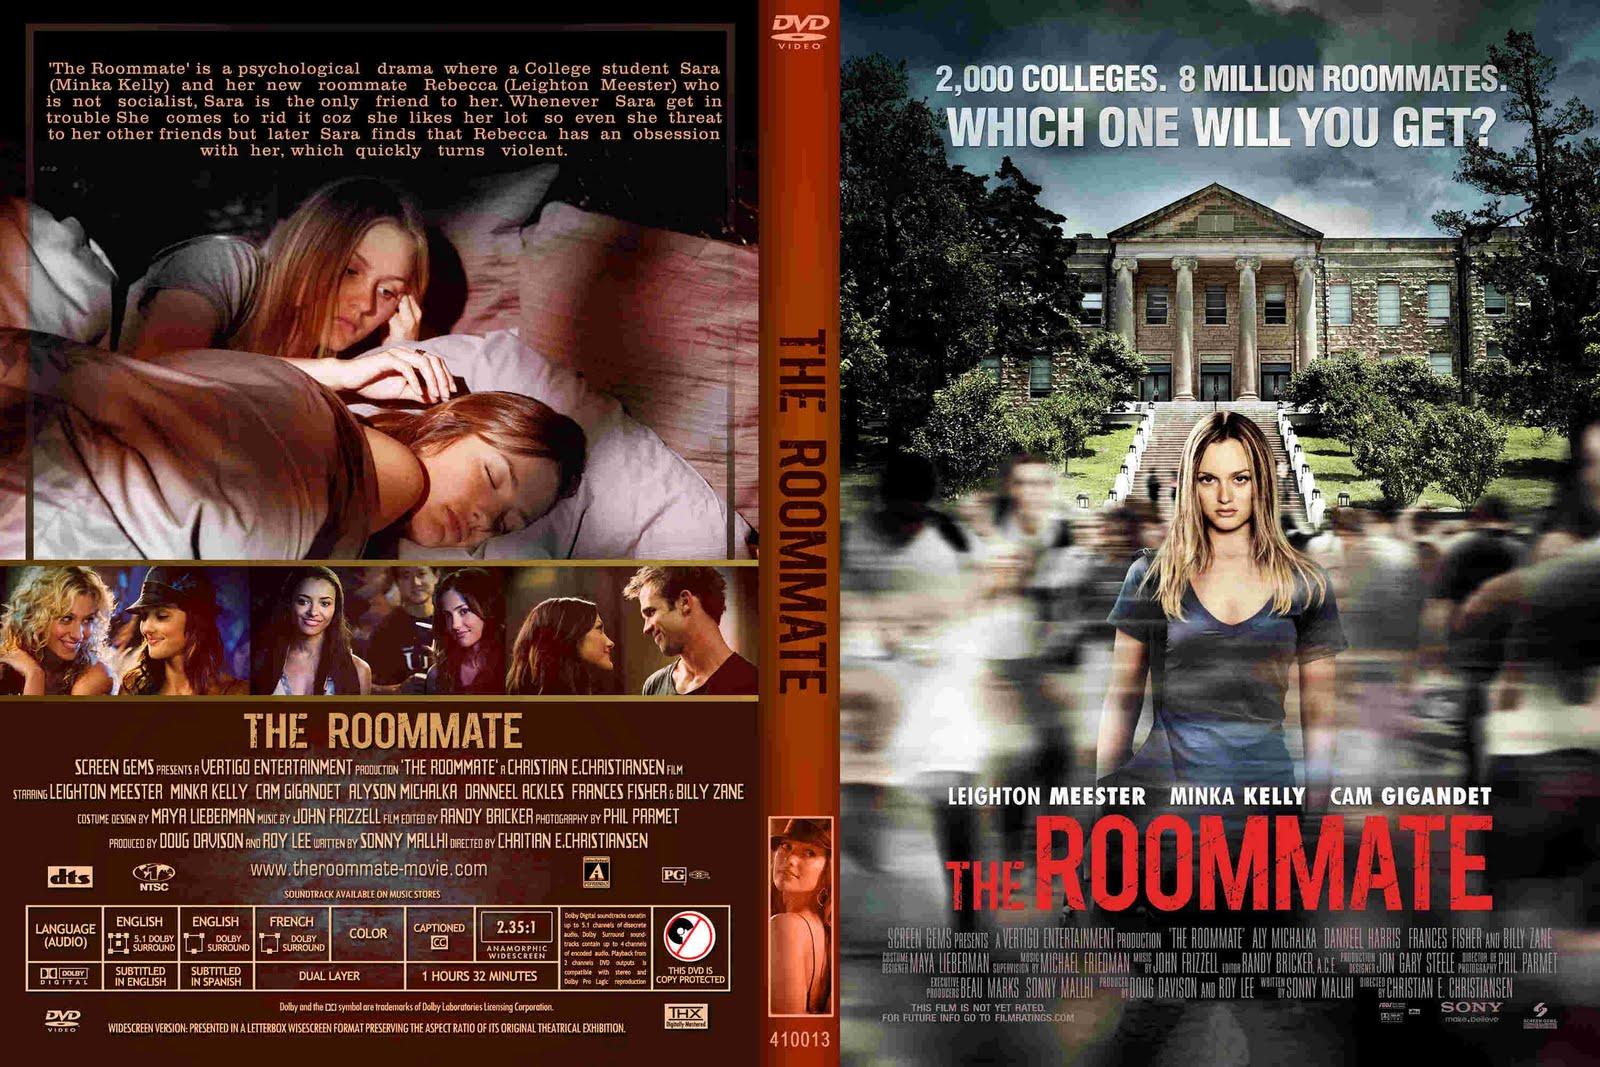 http://3.bp.blogspot.com/-1gX79qkQaTM/TdR1Ig7dOKI/AAAAAAAAAEM/qB5E0tkmt0o/s1600/The_Roommate.jpg